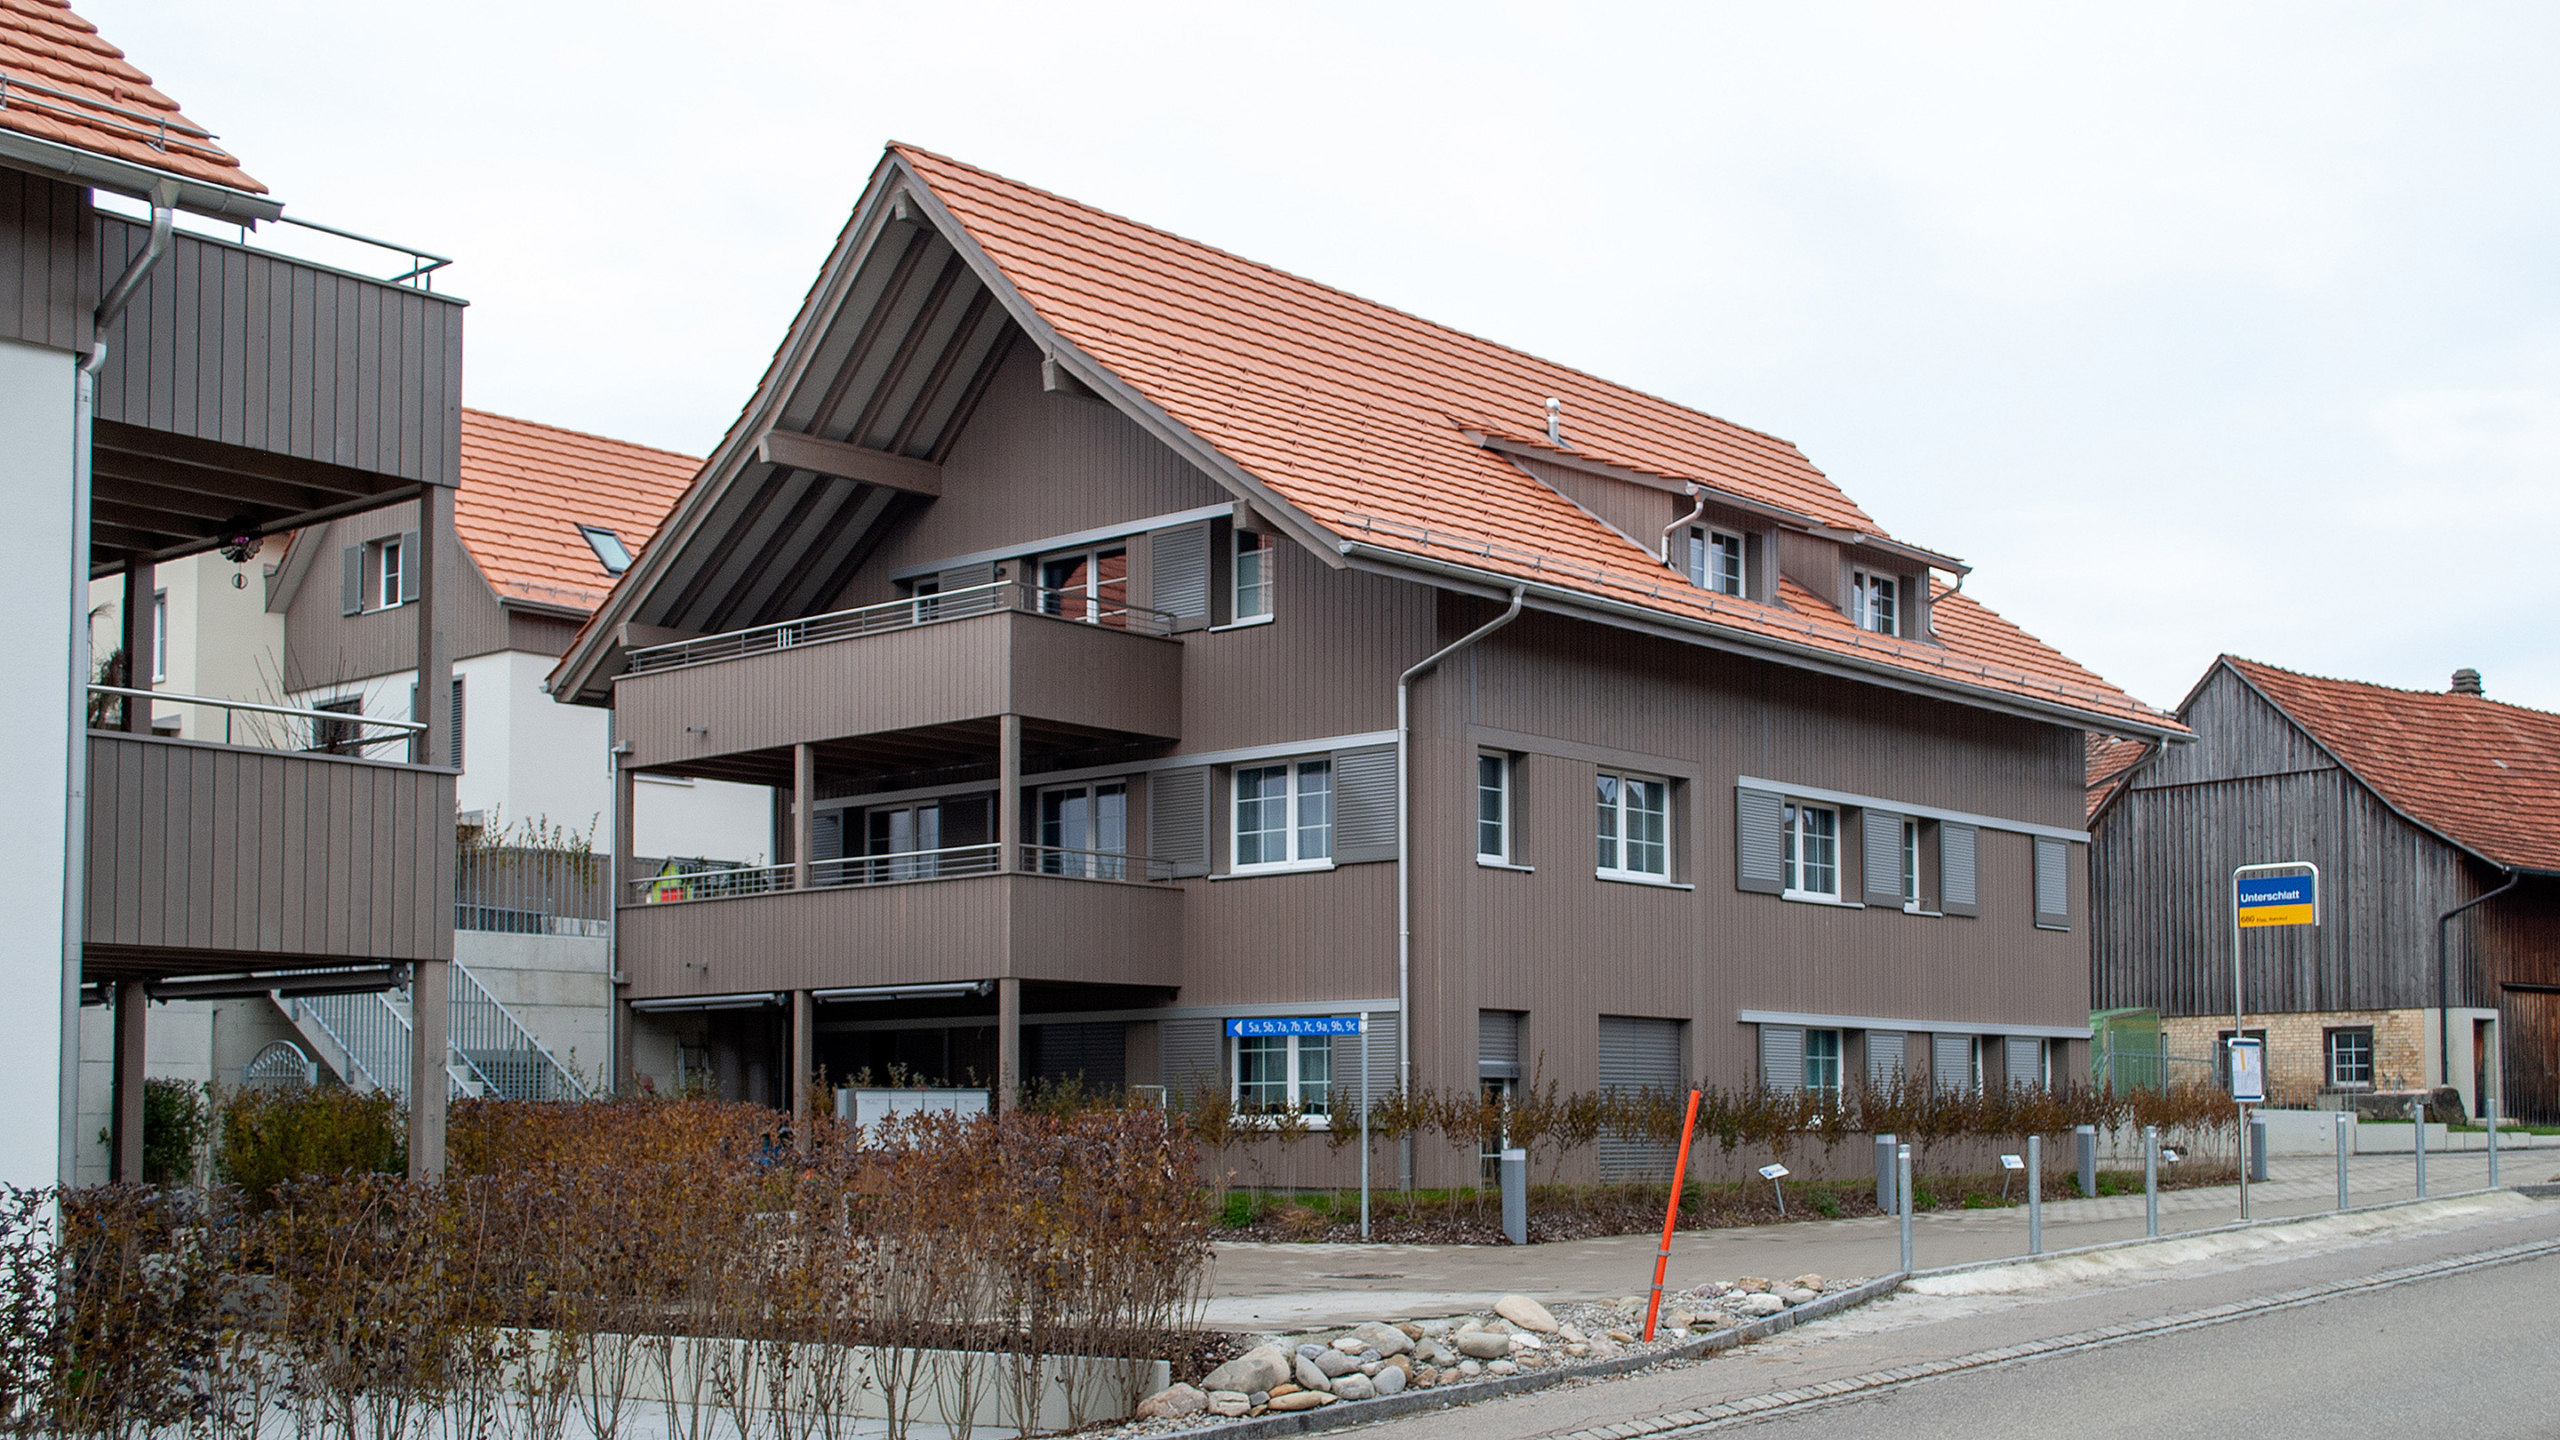 Projekt Schauenbergblick in Schlatt, Haus B